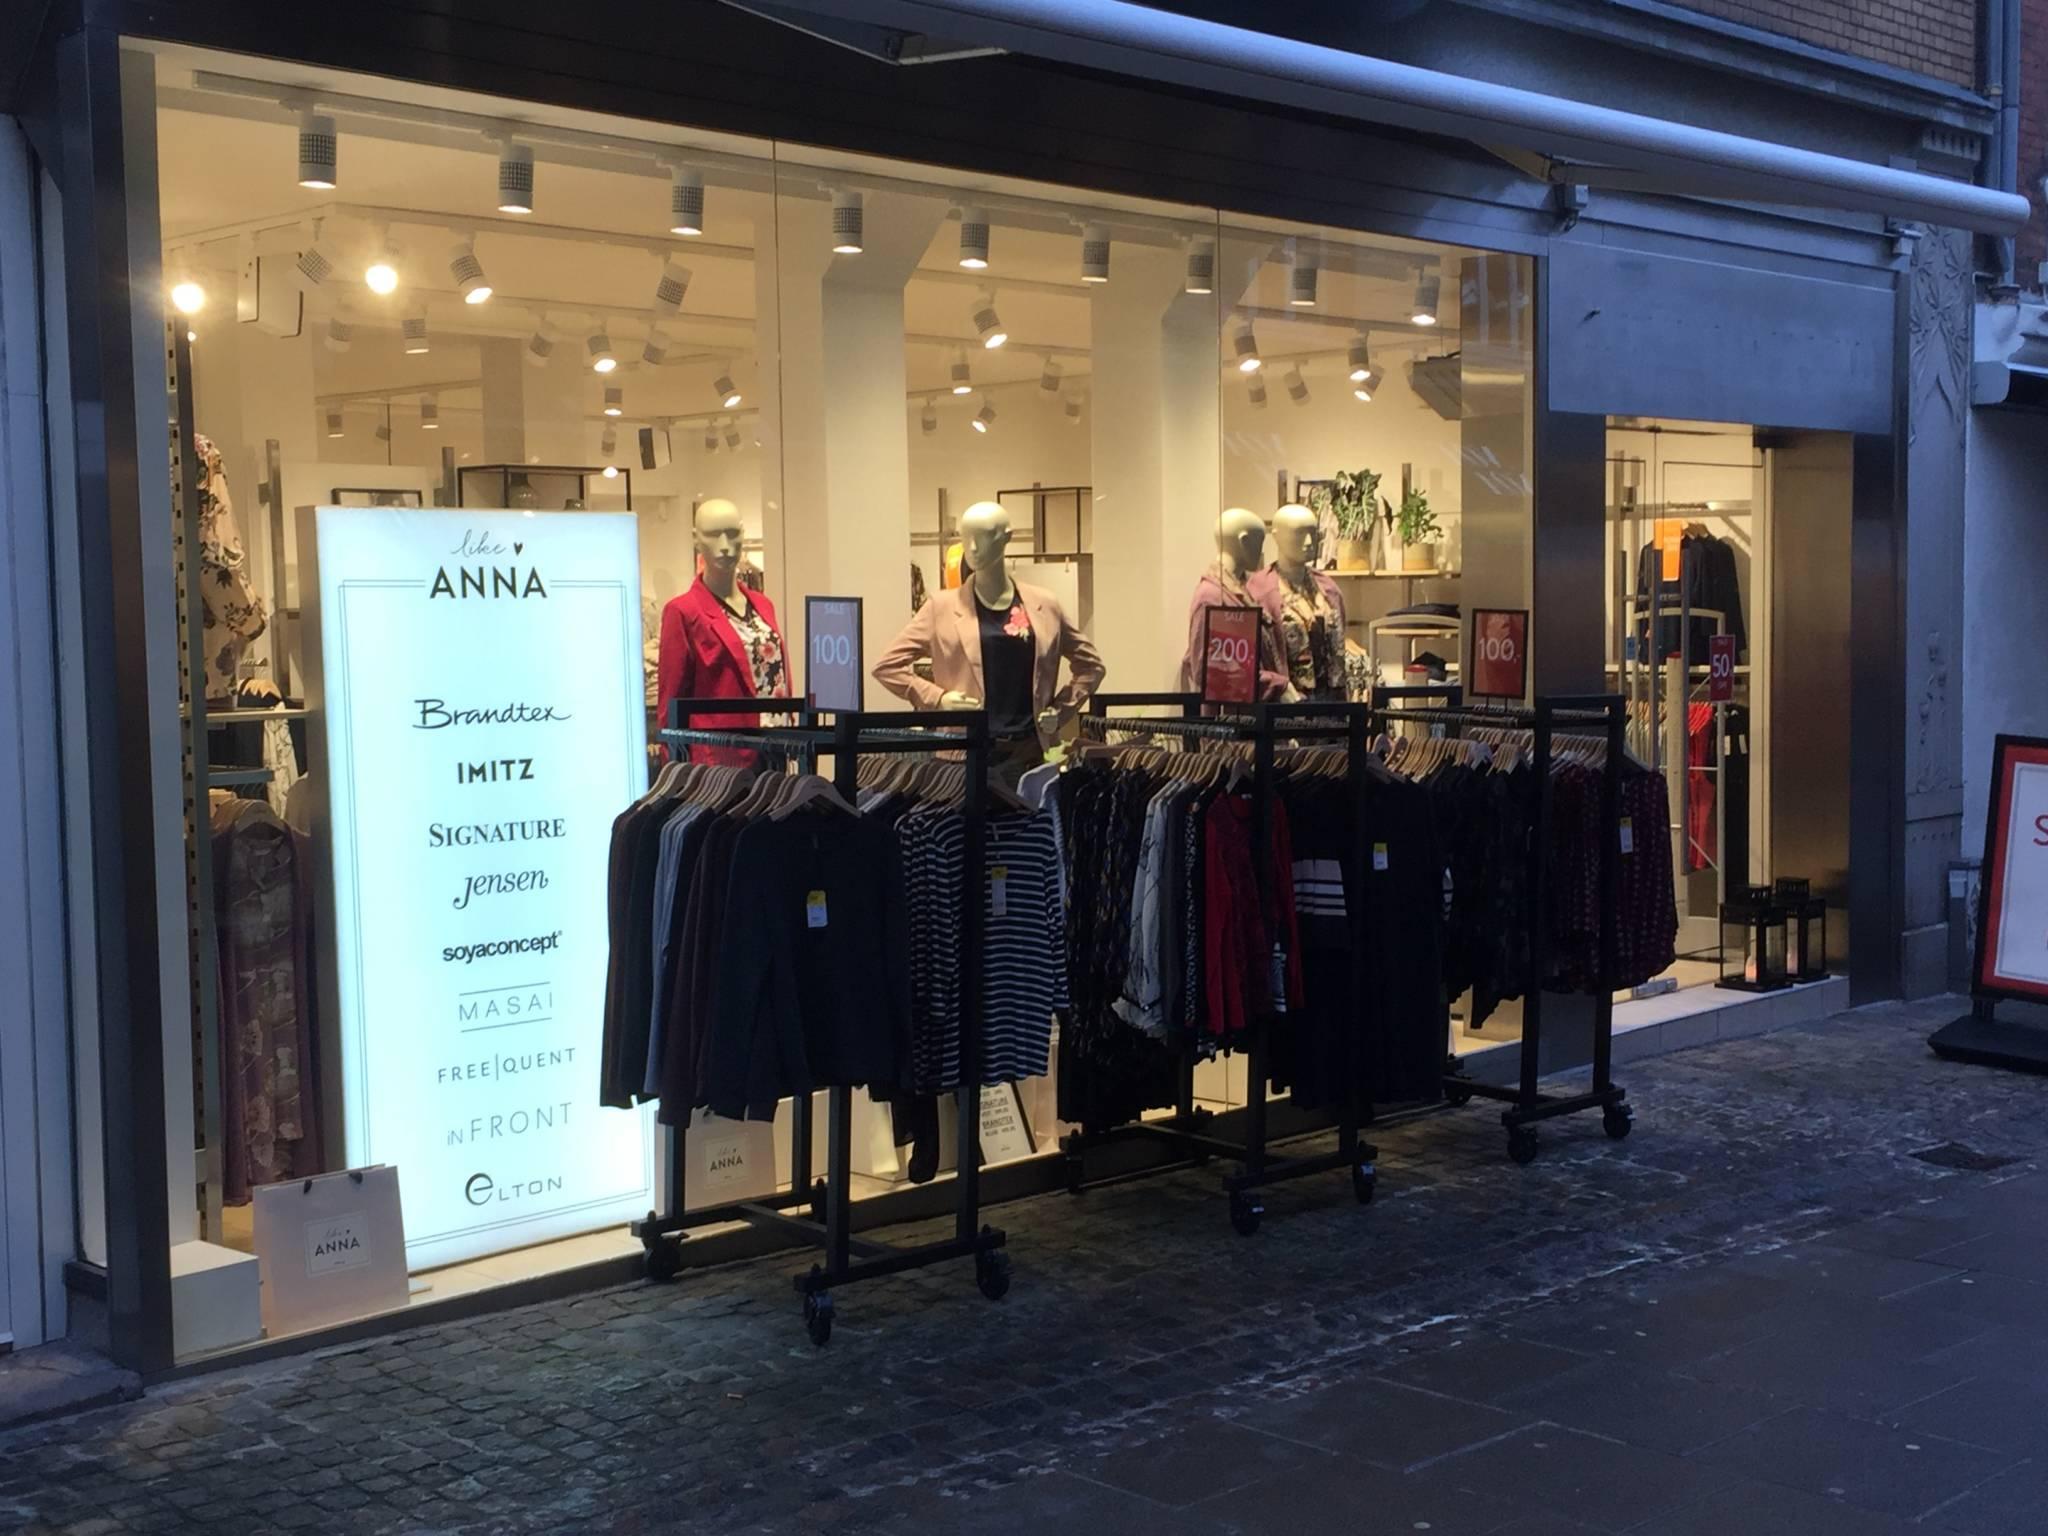 flot indrettet modebutik i Ålborg. Butiksinventar. Butiksindretning.